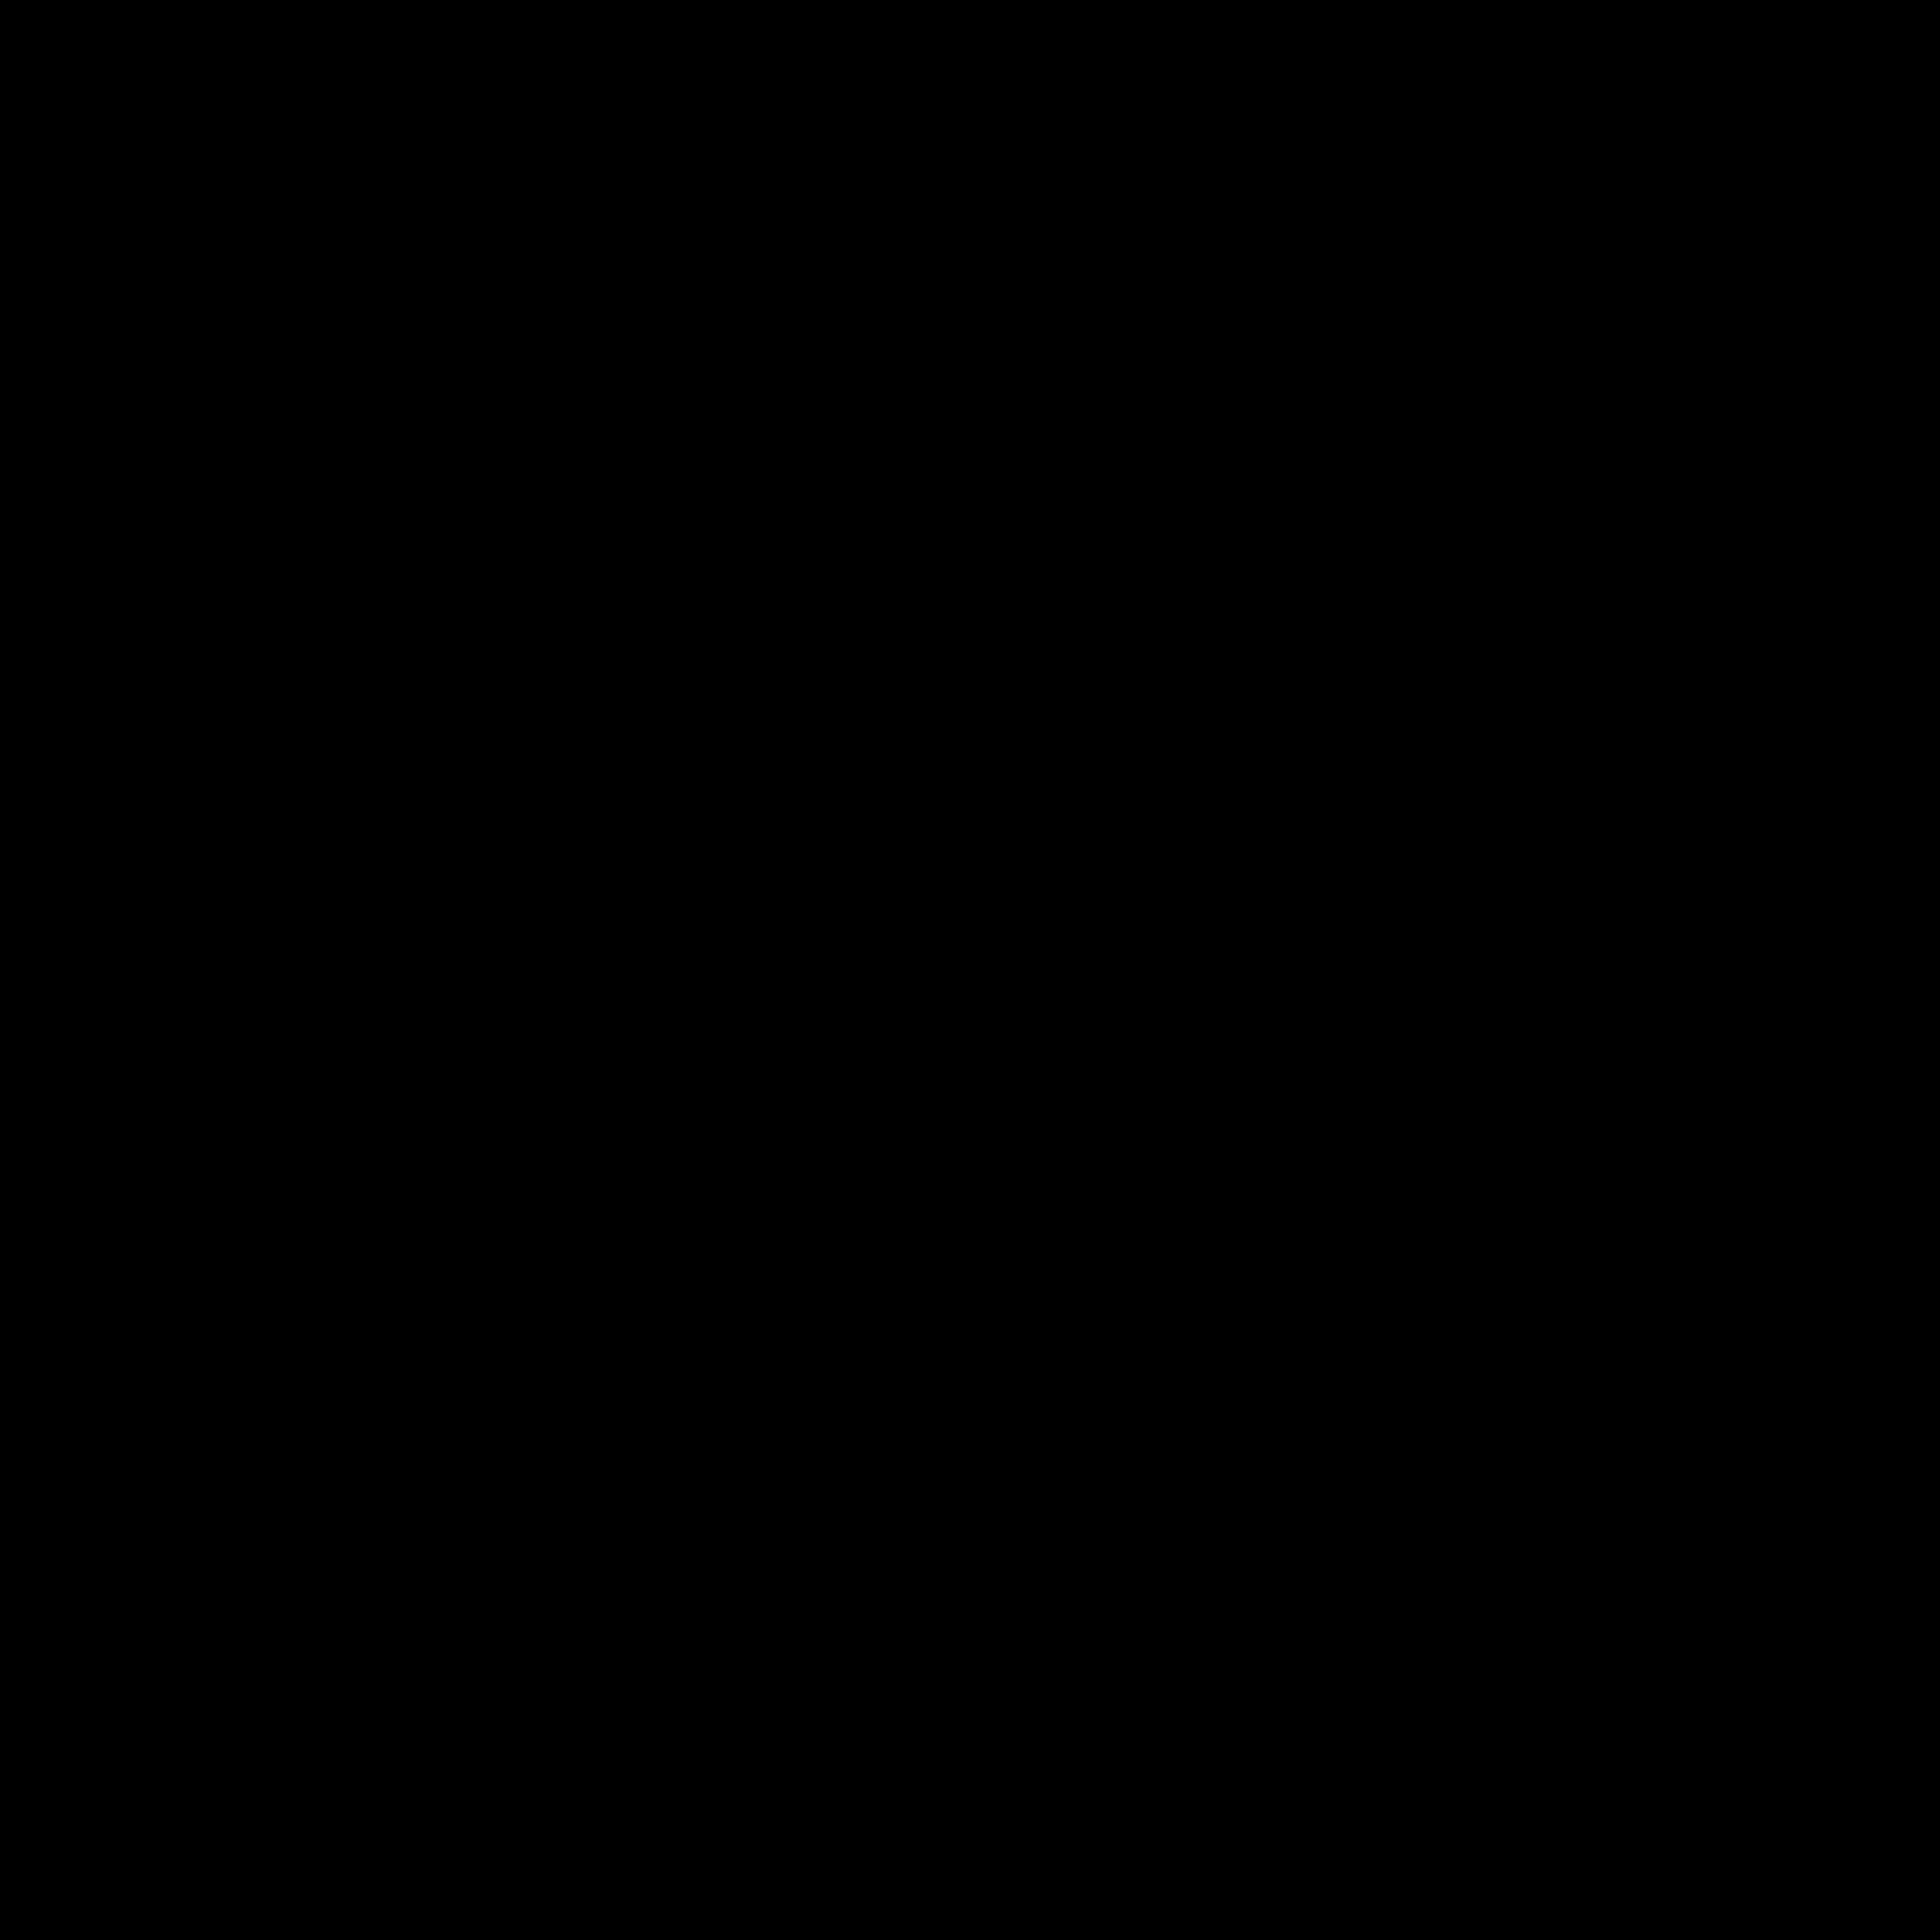 pin Gears clipart logo #5 - Gear Logo Vector PNG